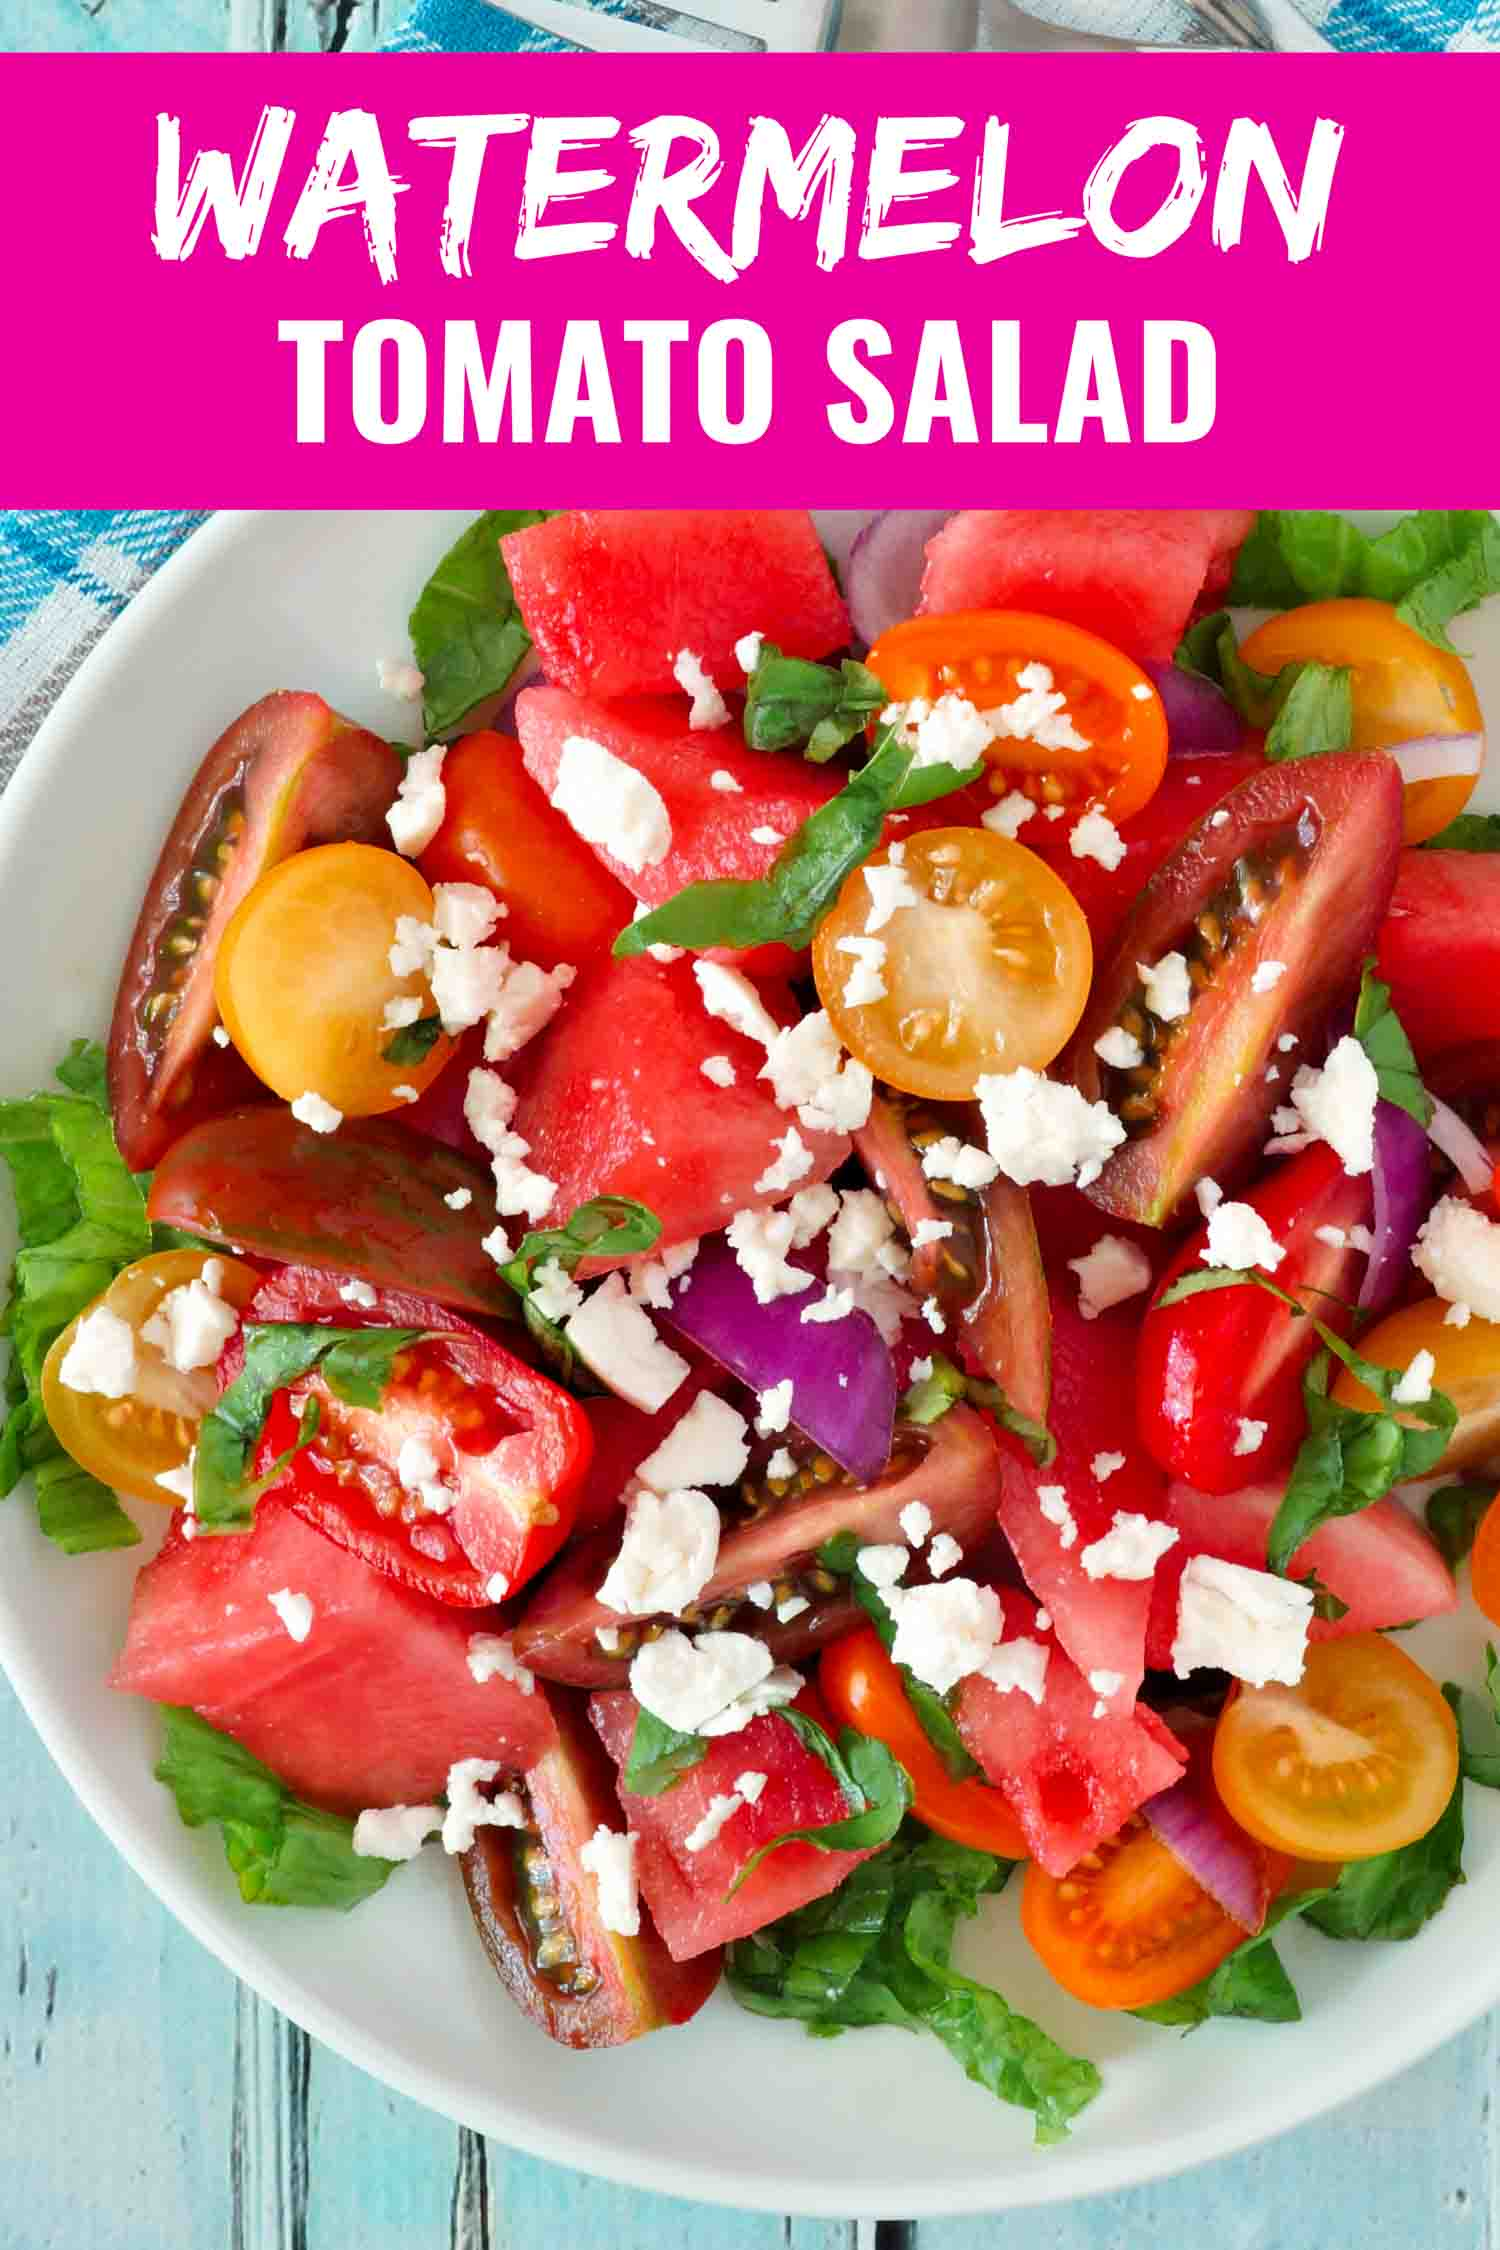 Heirloom tomato watermelon sald